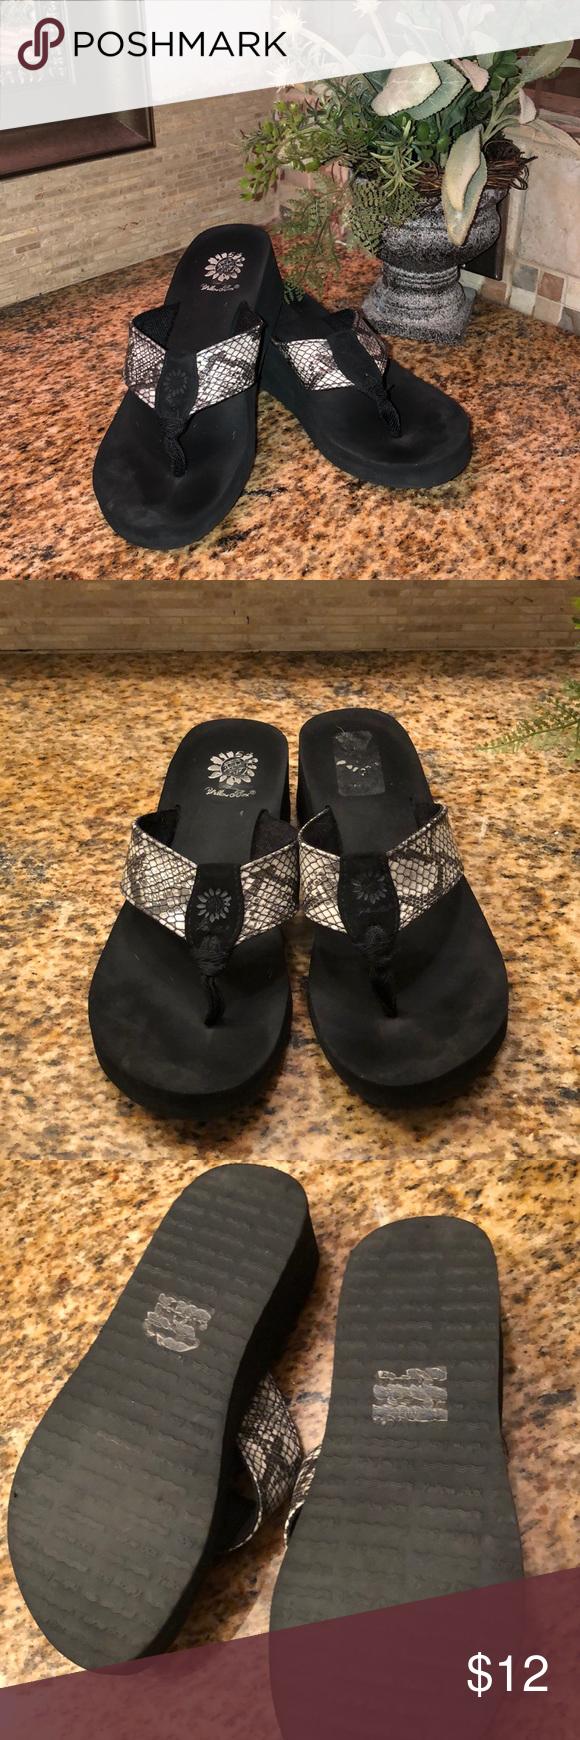 Guess black snake skin thong sandals